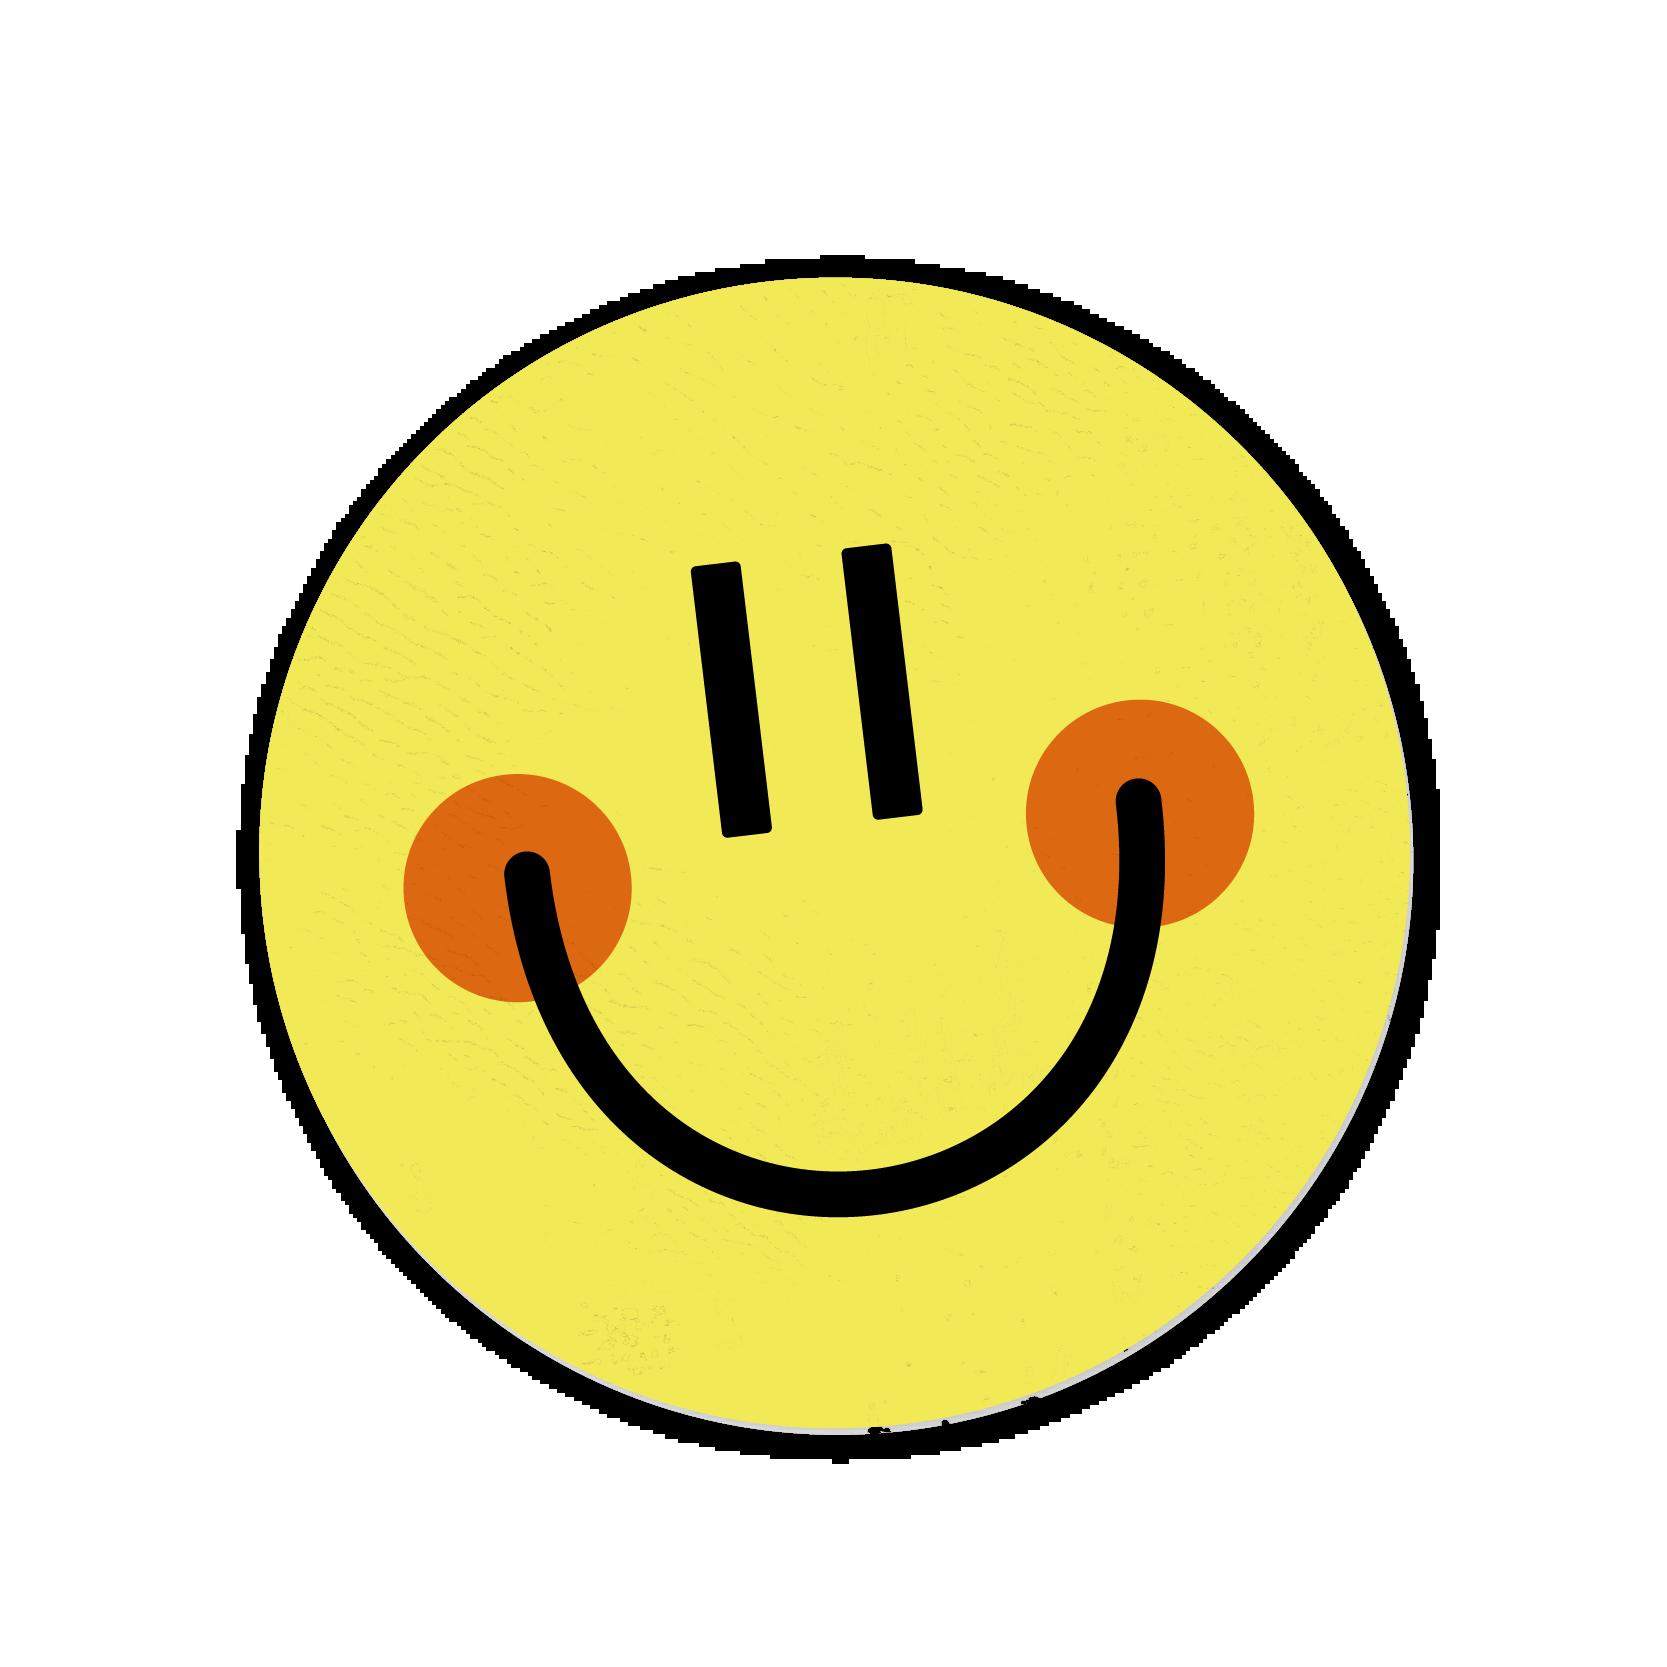 A yellow smiley face sticker